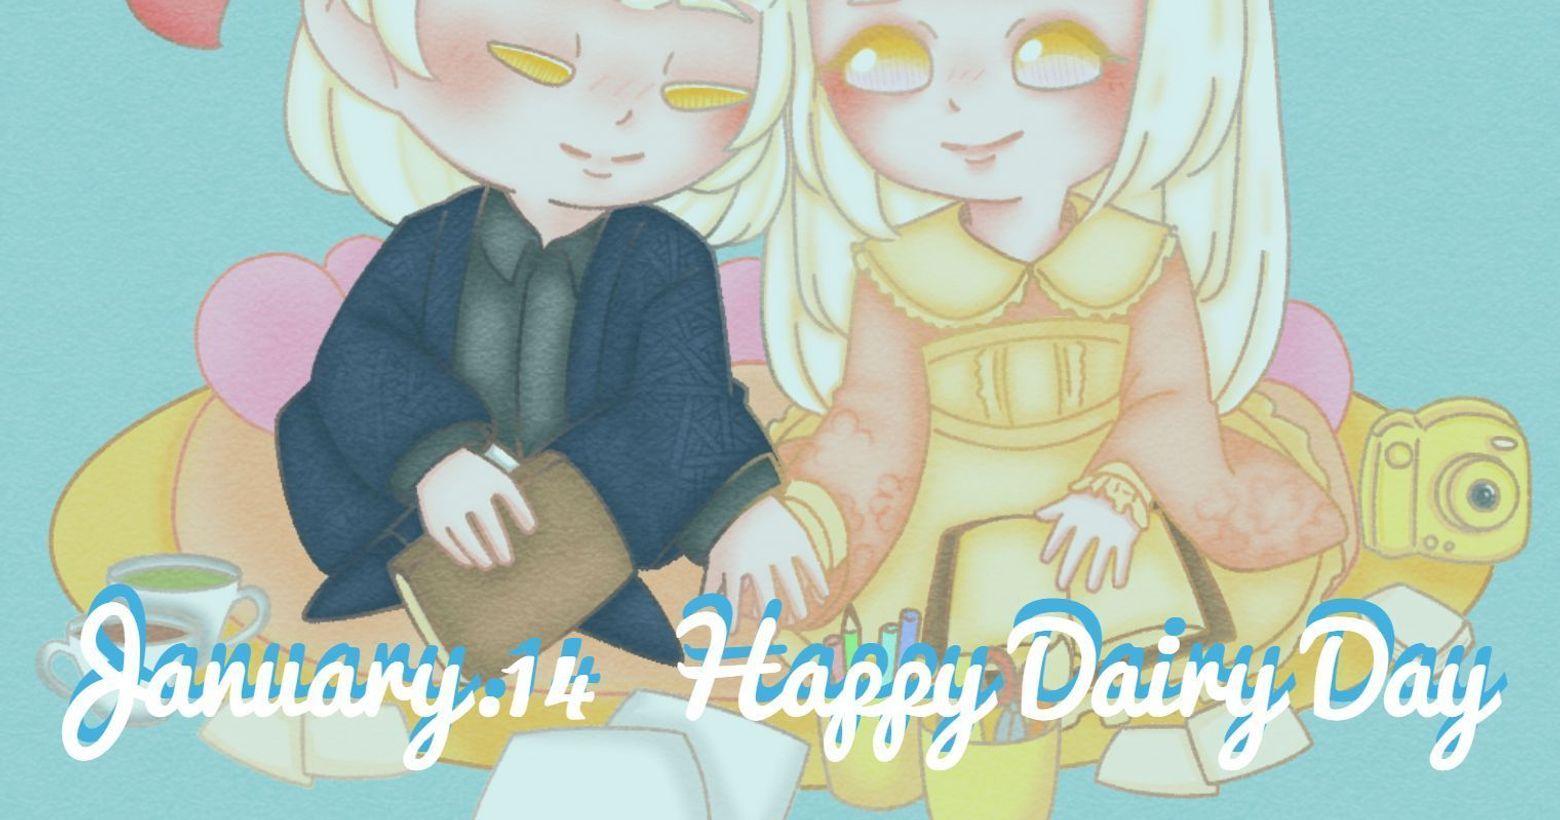 01/14 Happy Dairy Day#2021January17Sunday日記情人節Dair